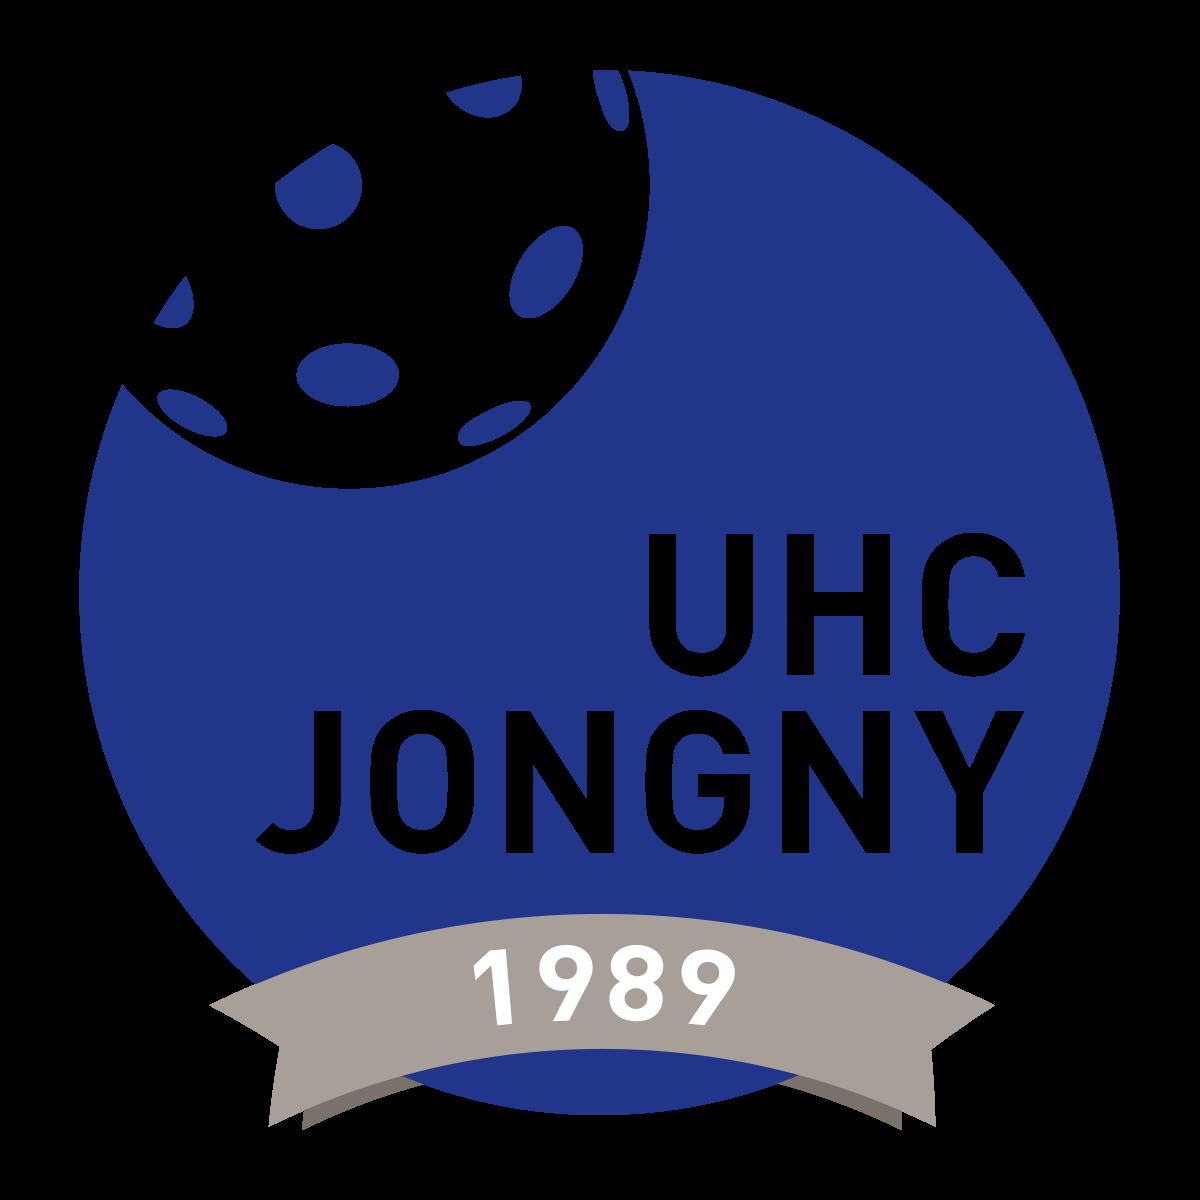 UHC JONGNY